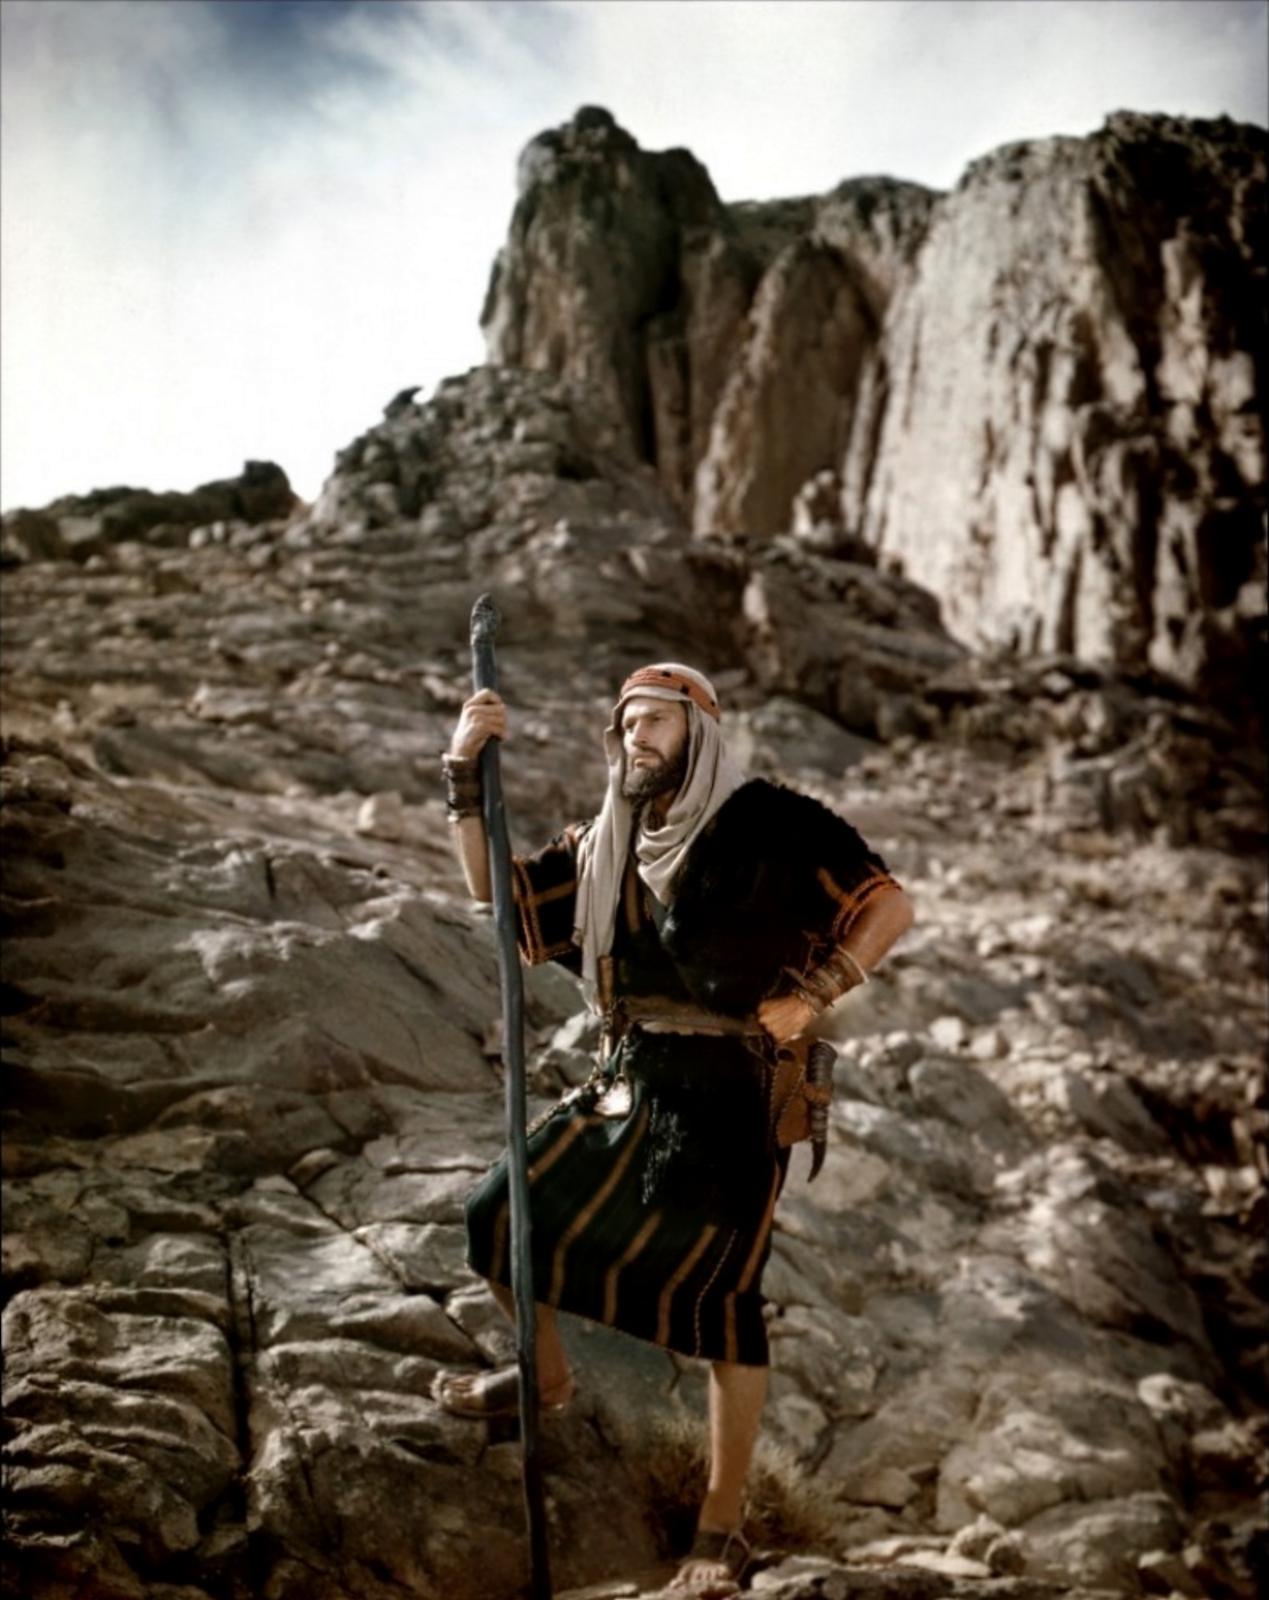 Charlton Heston in The Ten Commandments